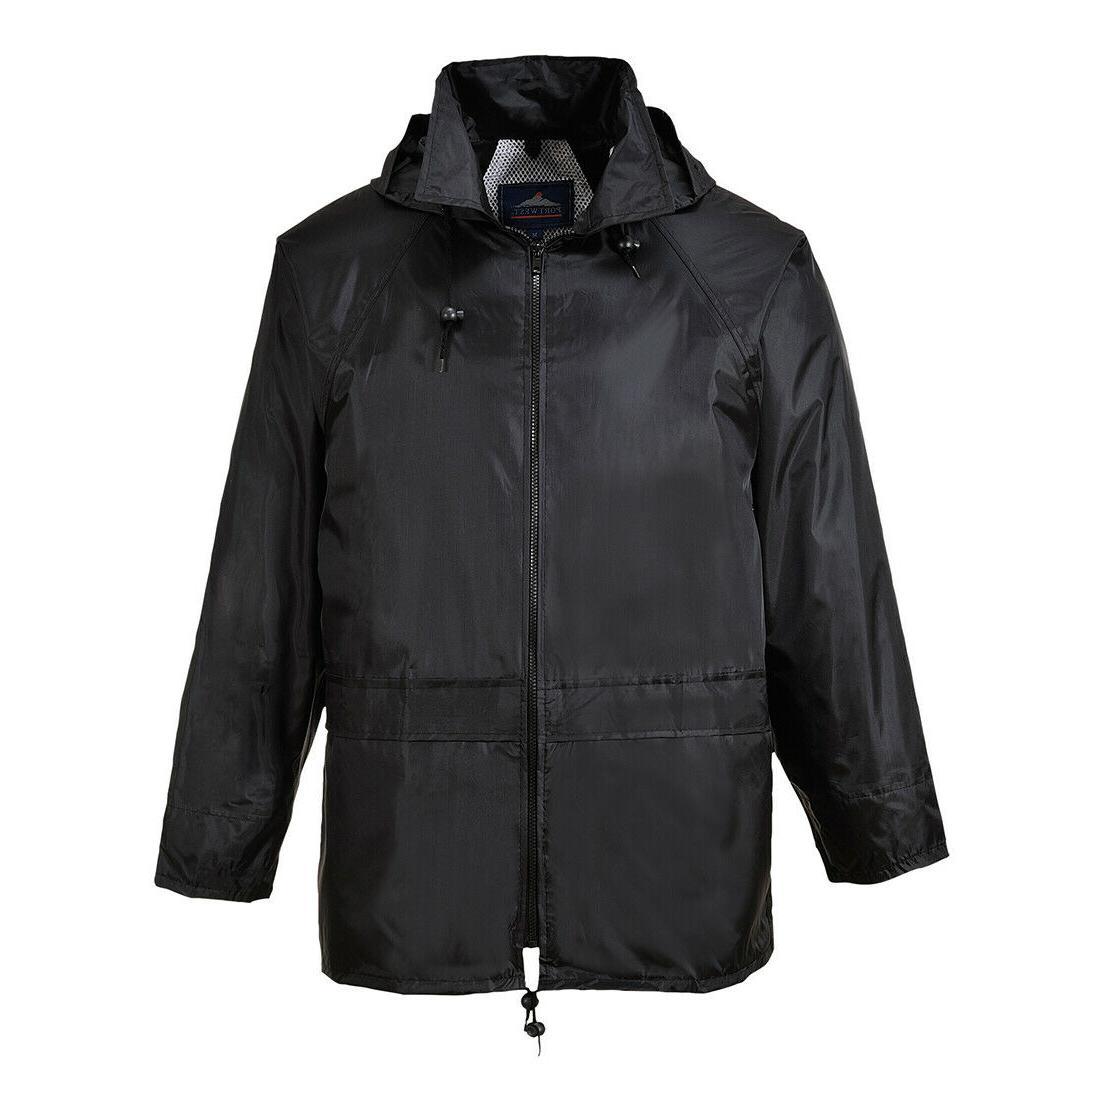 Portwest Classic Jacket hood